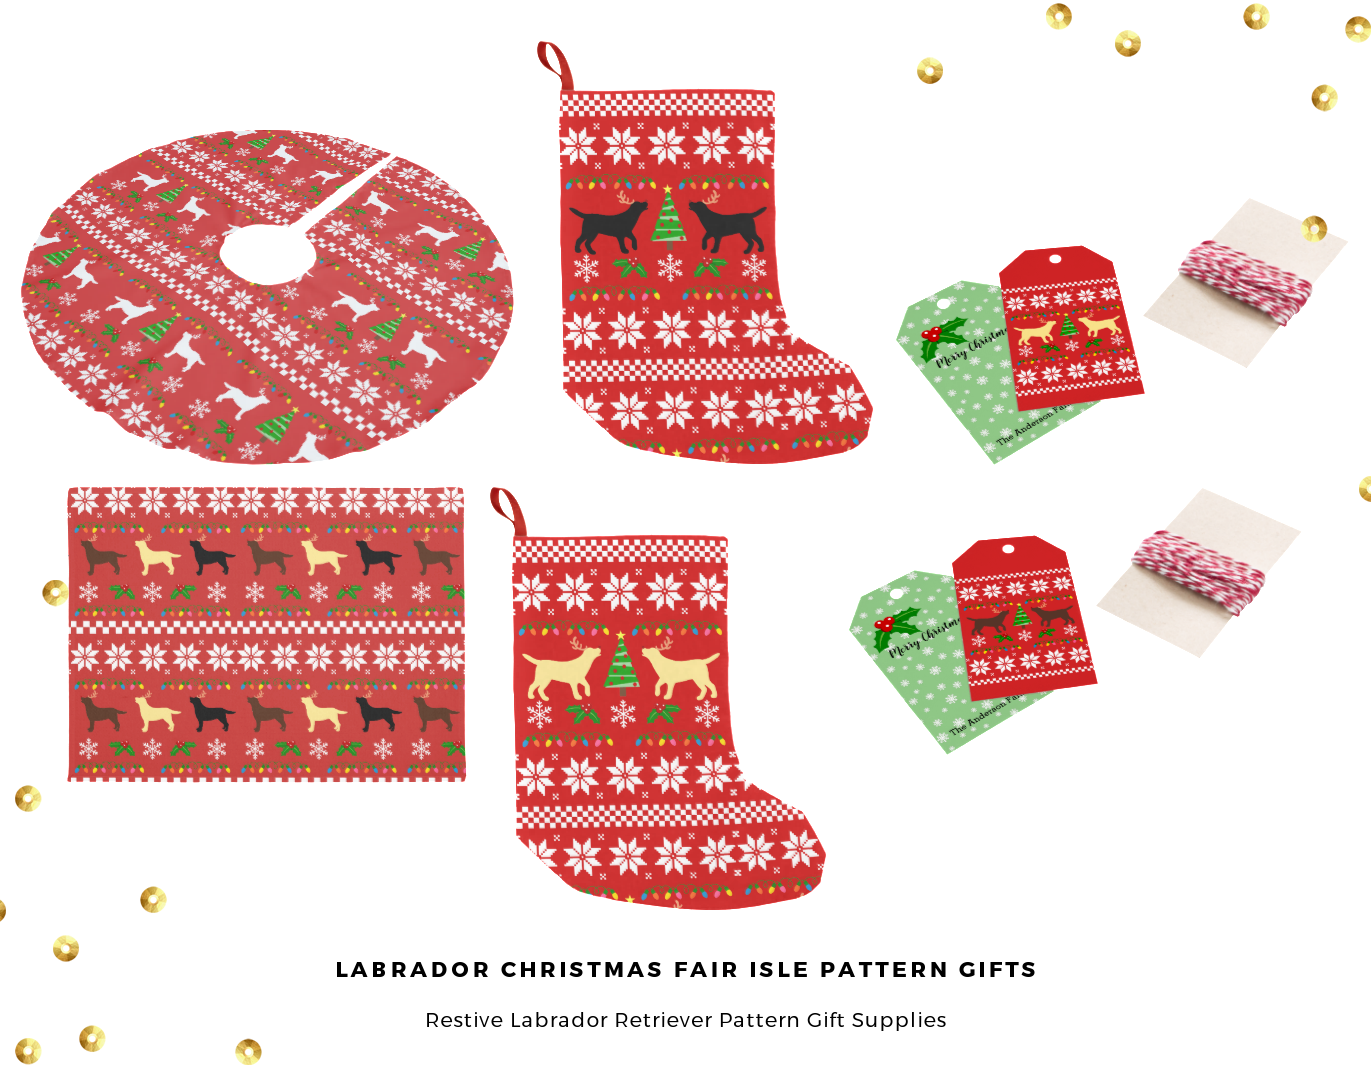 Christmas Labrador Retriever Fair Isle Pattern Gift Ideas -- Home Decor, Gift Supplies, Apparel @zazzle